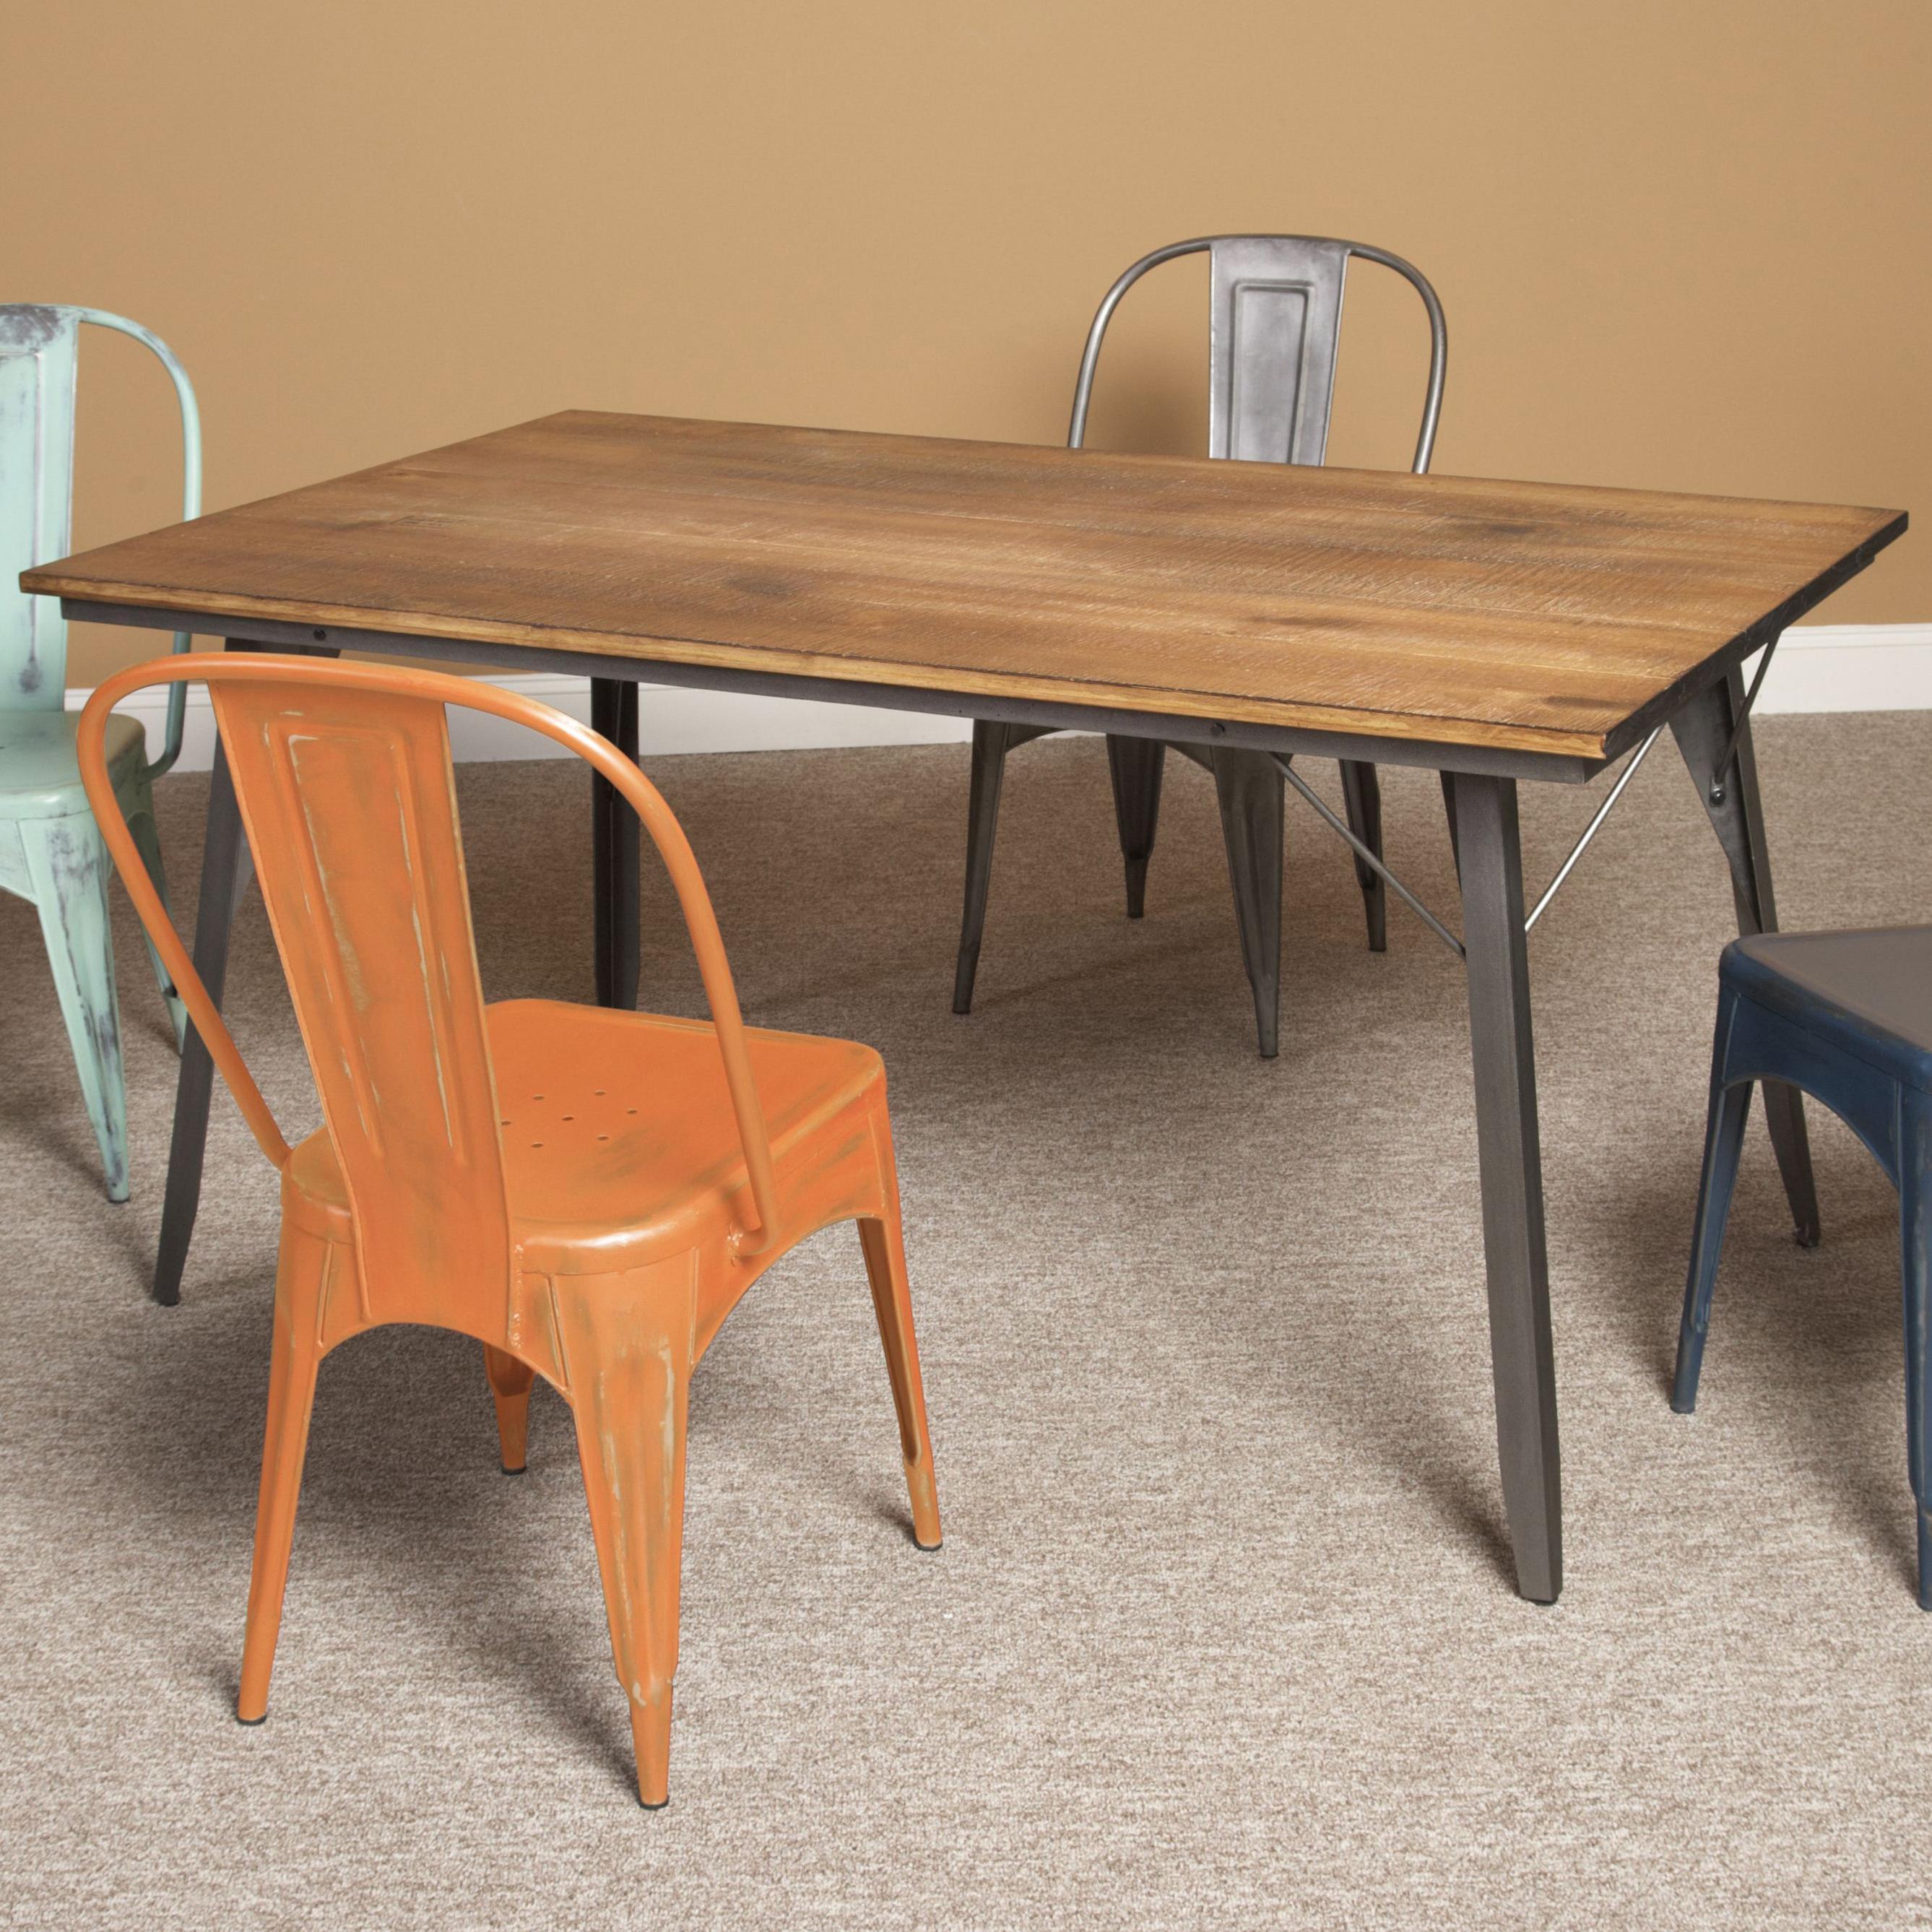 largo timbuktu wood metal rectangular dining table olinde 39 s furniture kitchen table. Black Bedroom Furniture Sets. Home Design Ideas